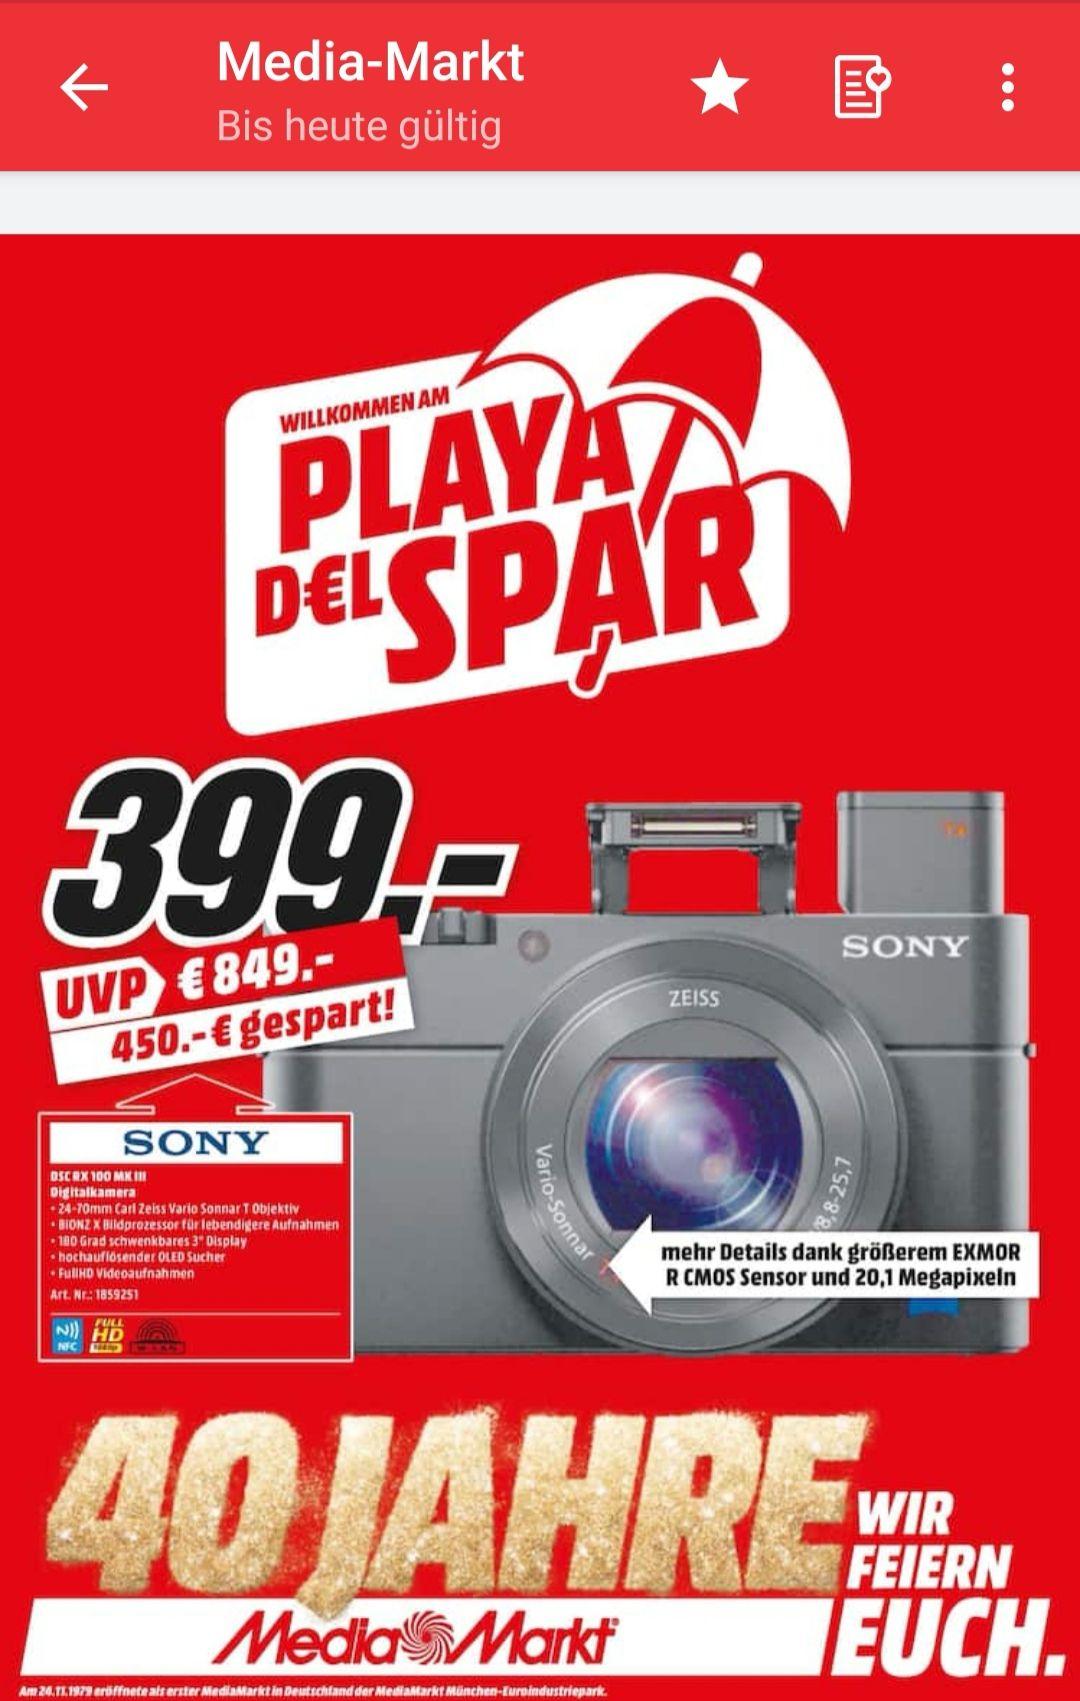 Lokal Media Markt Heilbronn Sony RX100 MK3